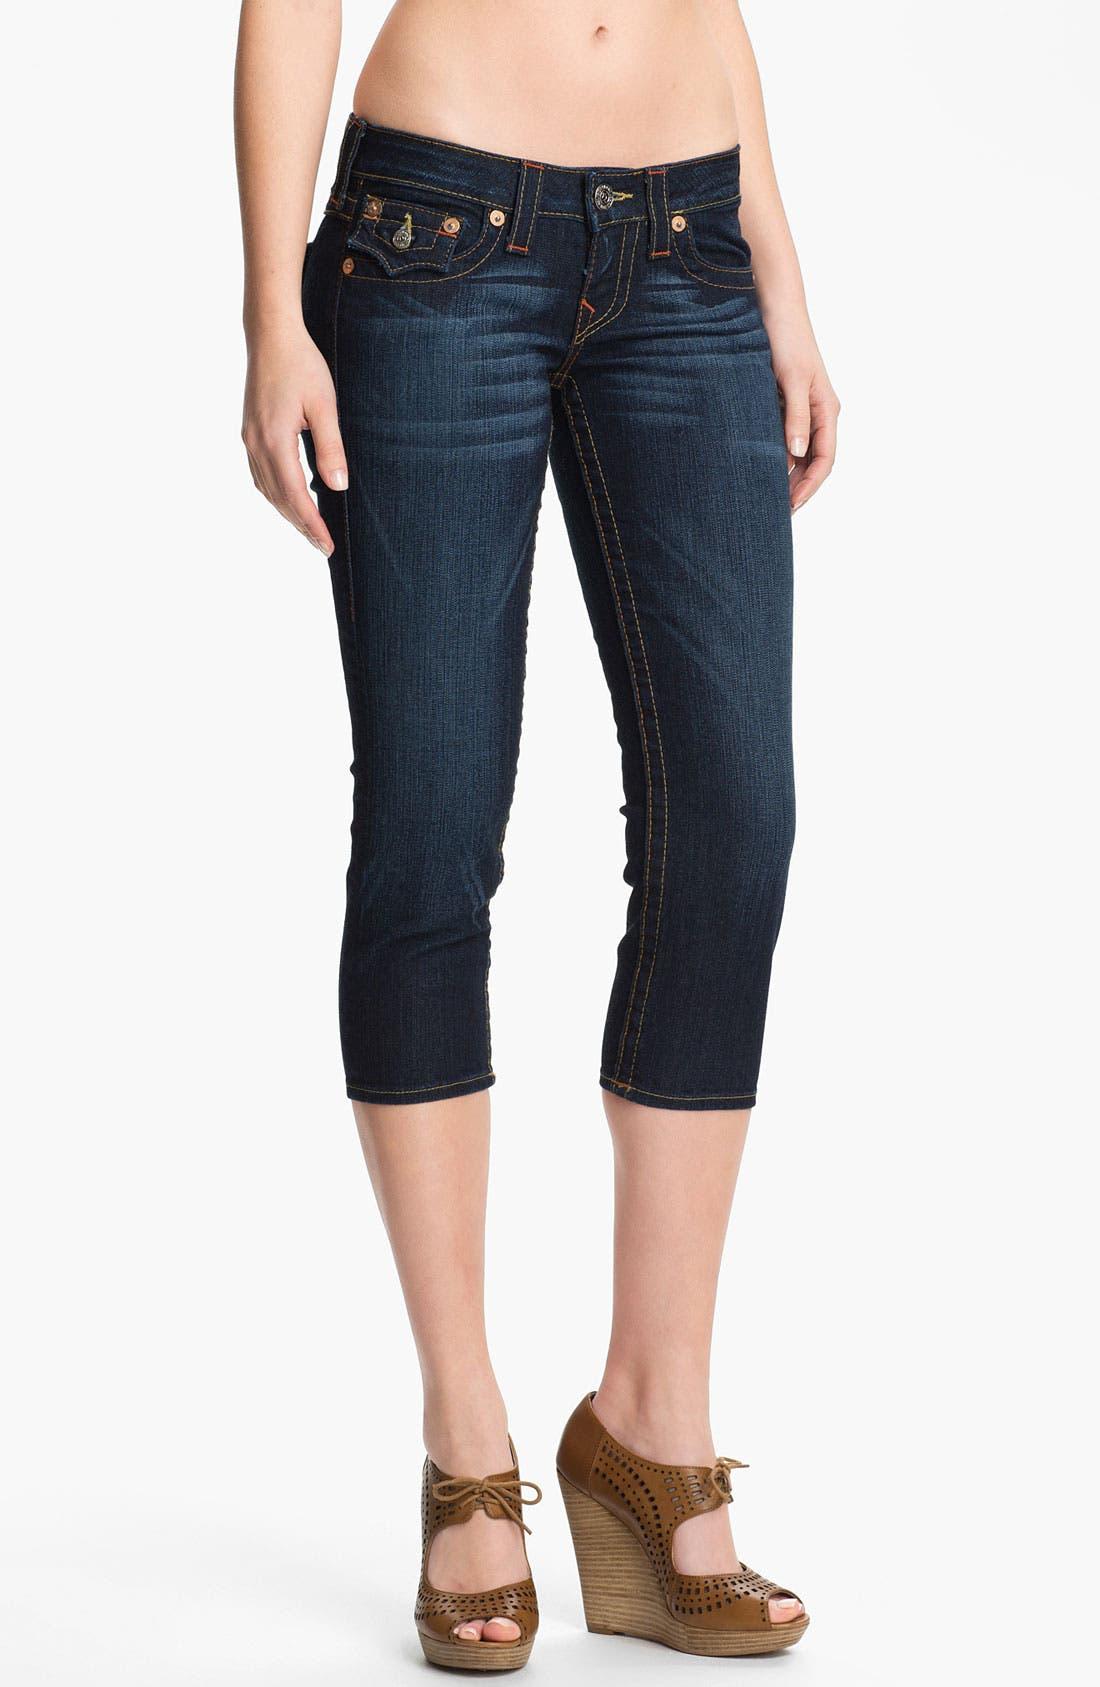 Main Image - True Religion Brand Jeans 'Lily' Crop Skinny Jeans (Dark Pony Express)